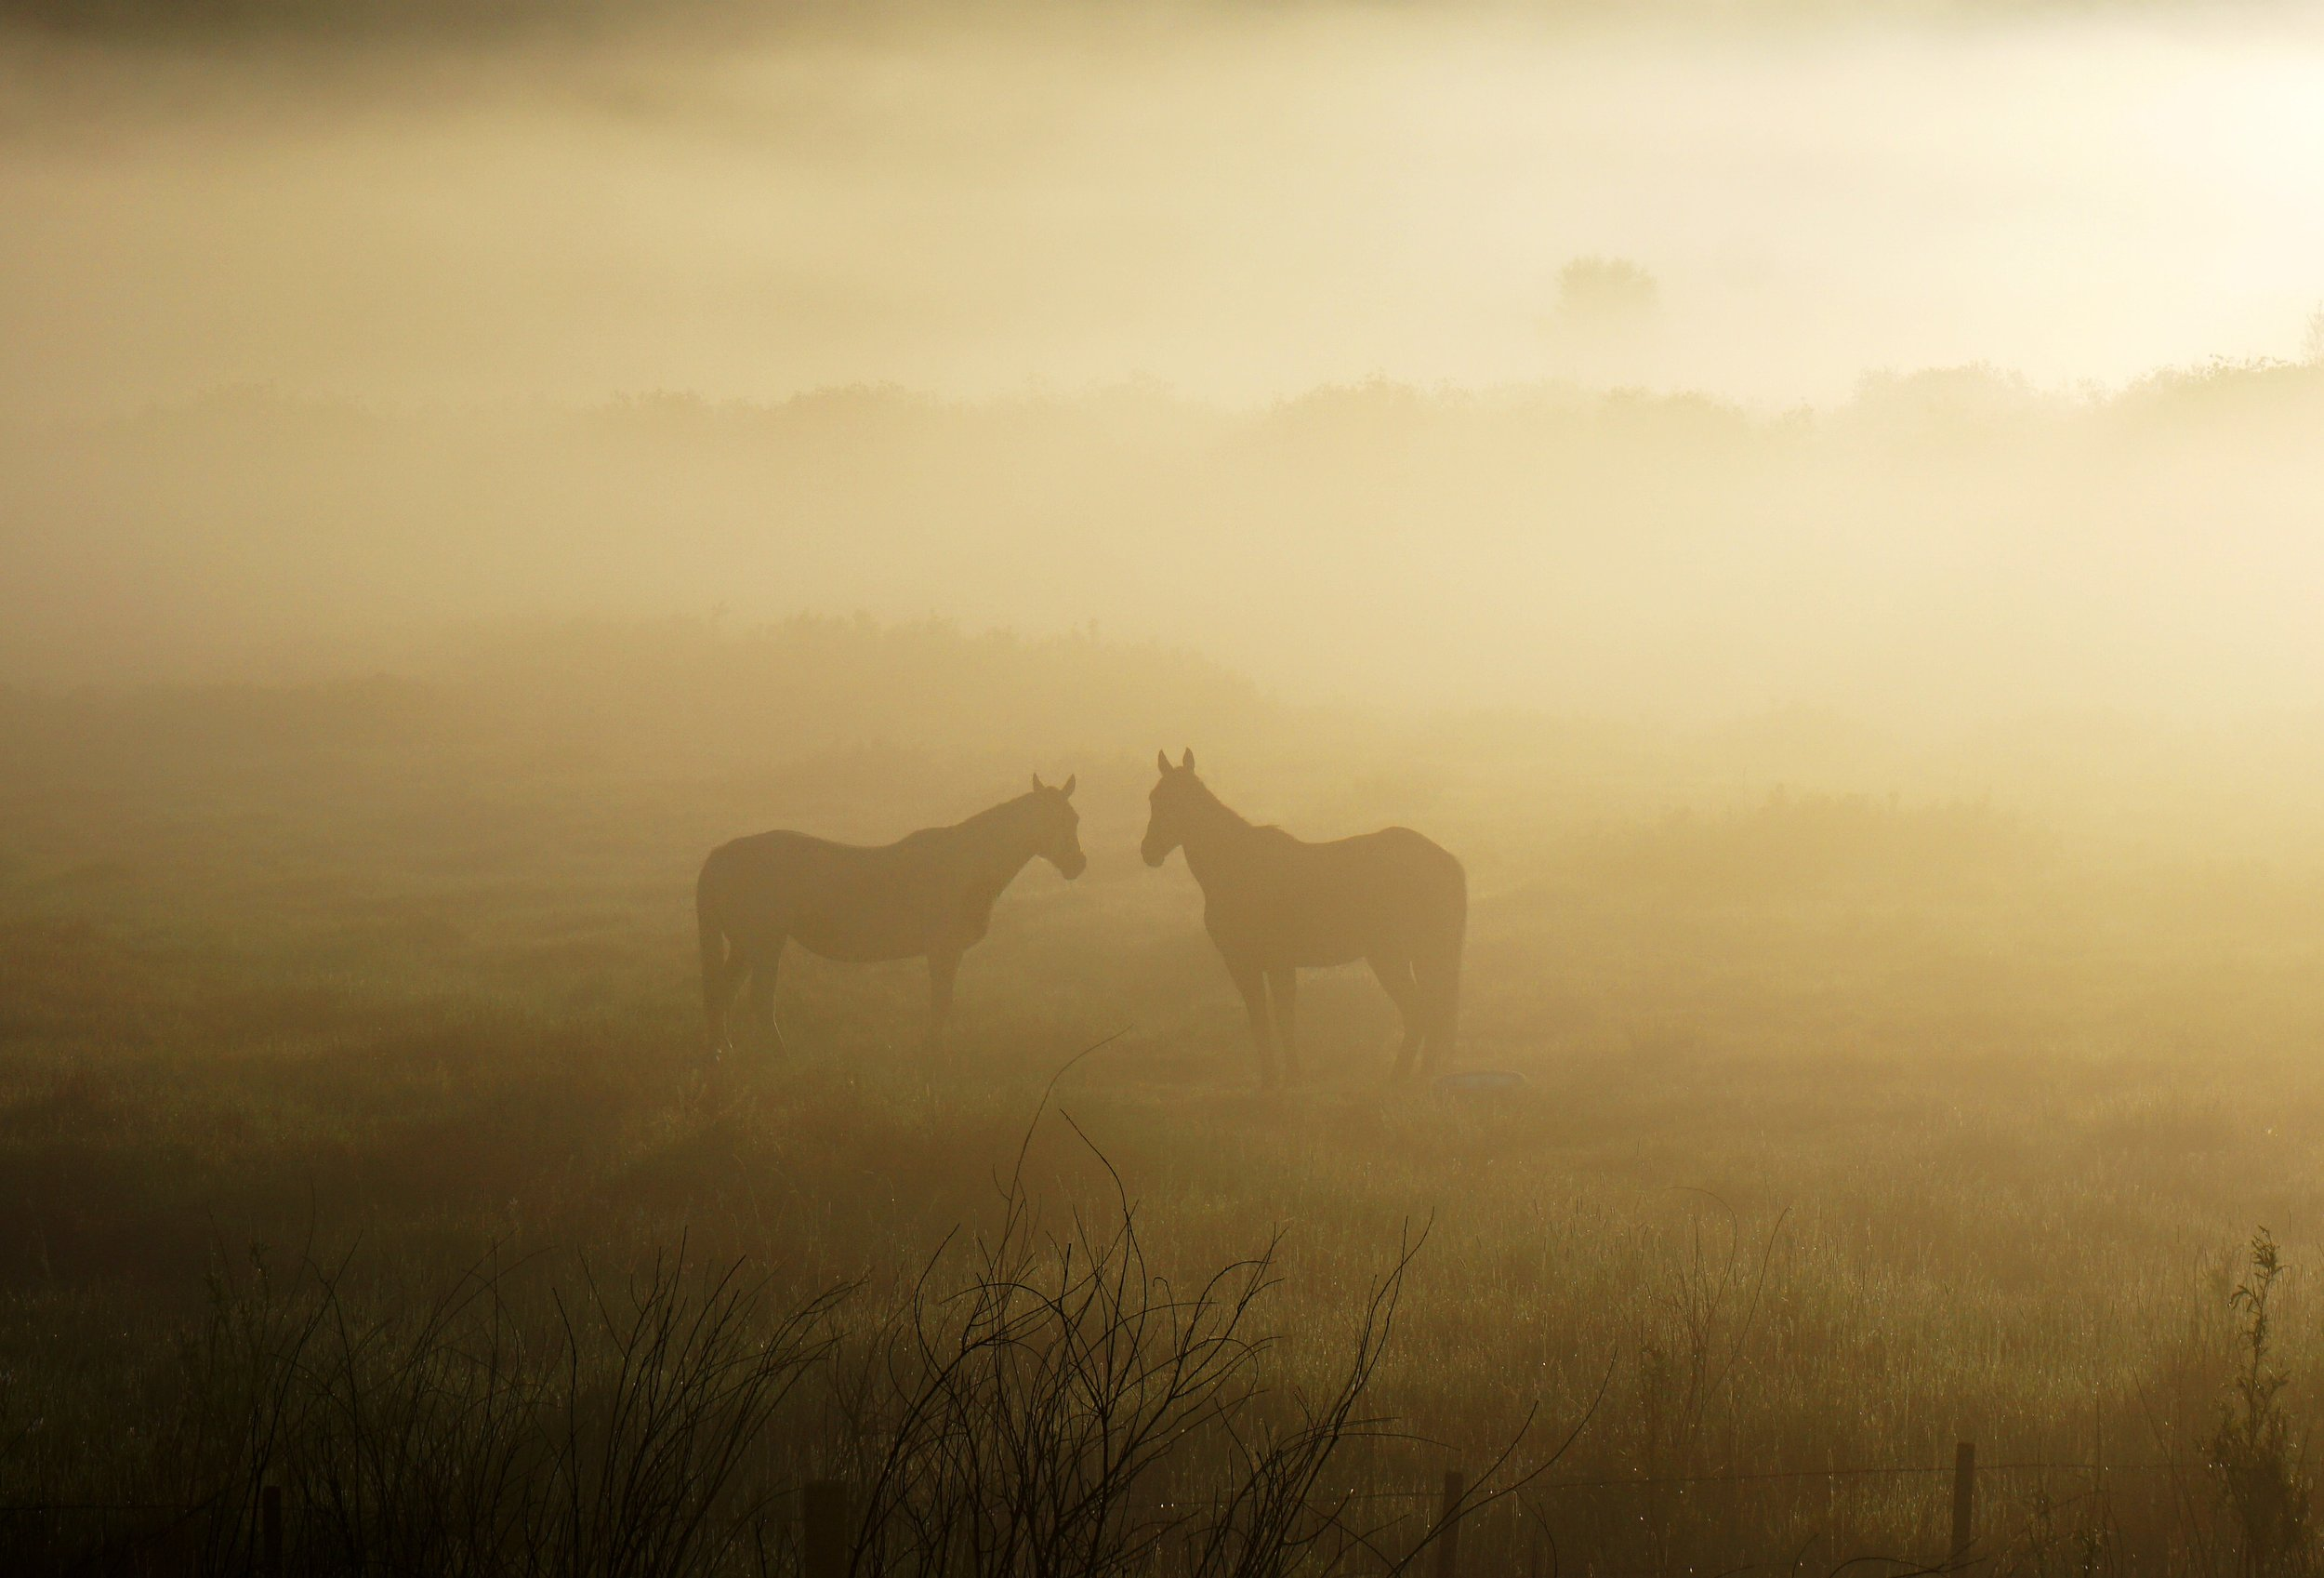 Horsecsunrise.jpg